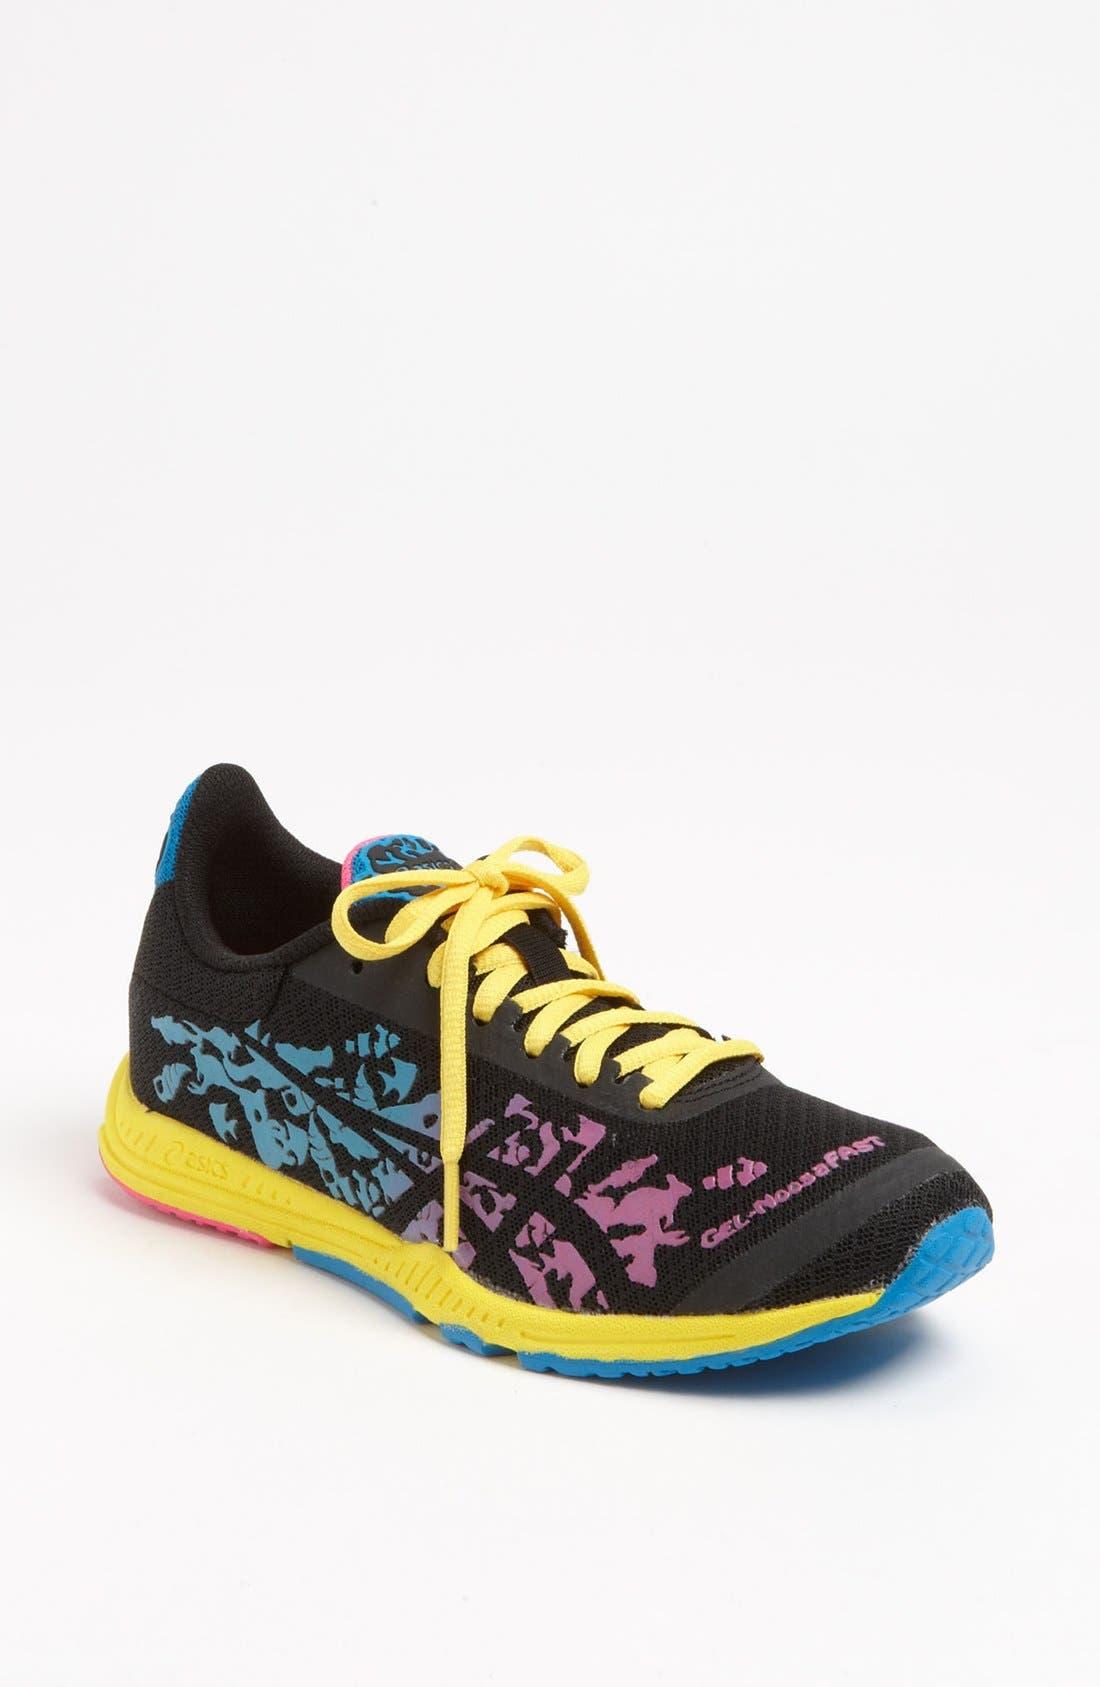 Main Image - ASICS® 'GEL-NoosaFAST™' Running Shoe (Women)